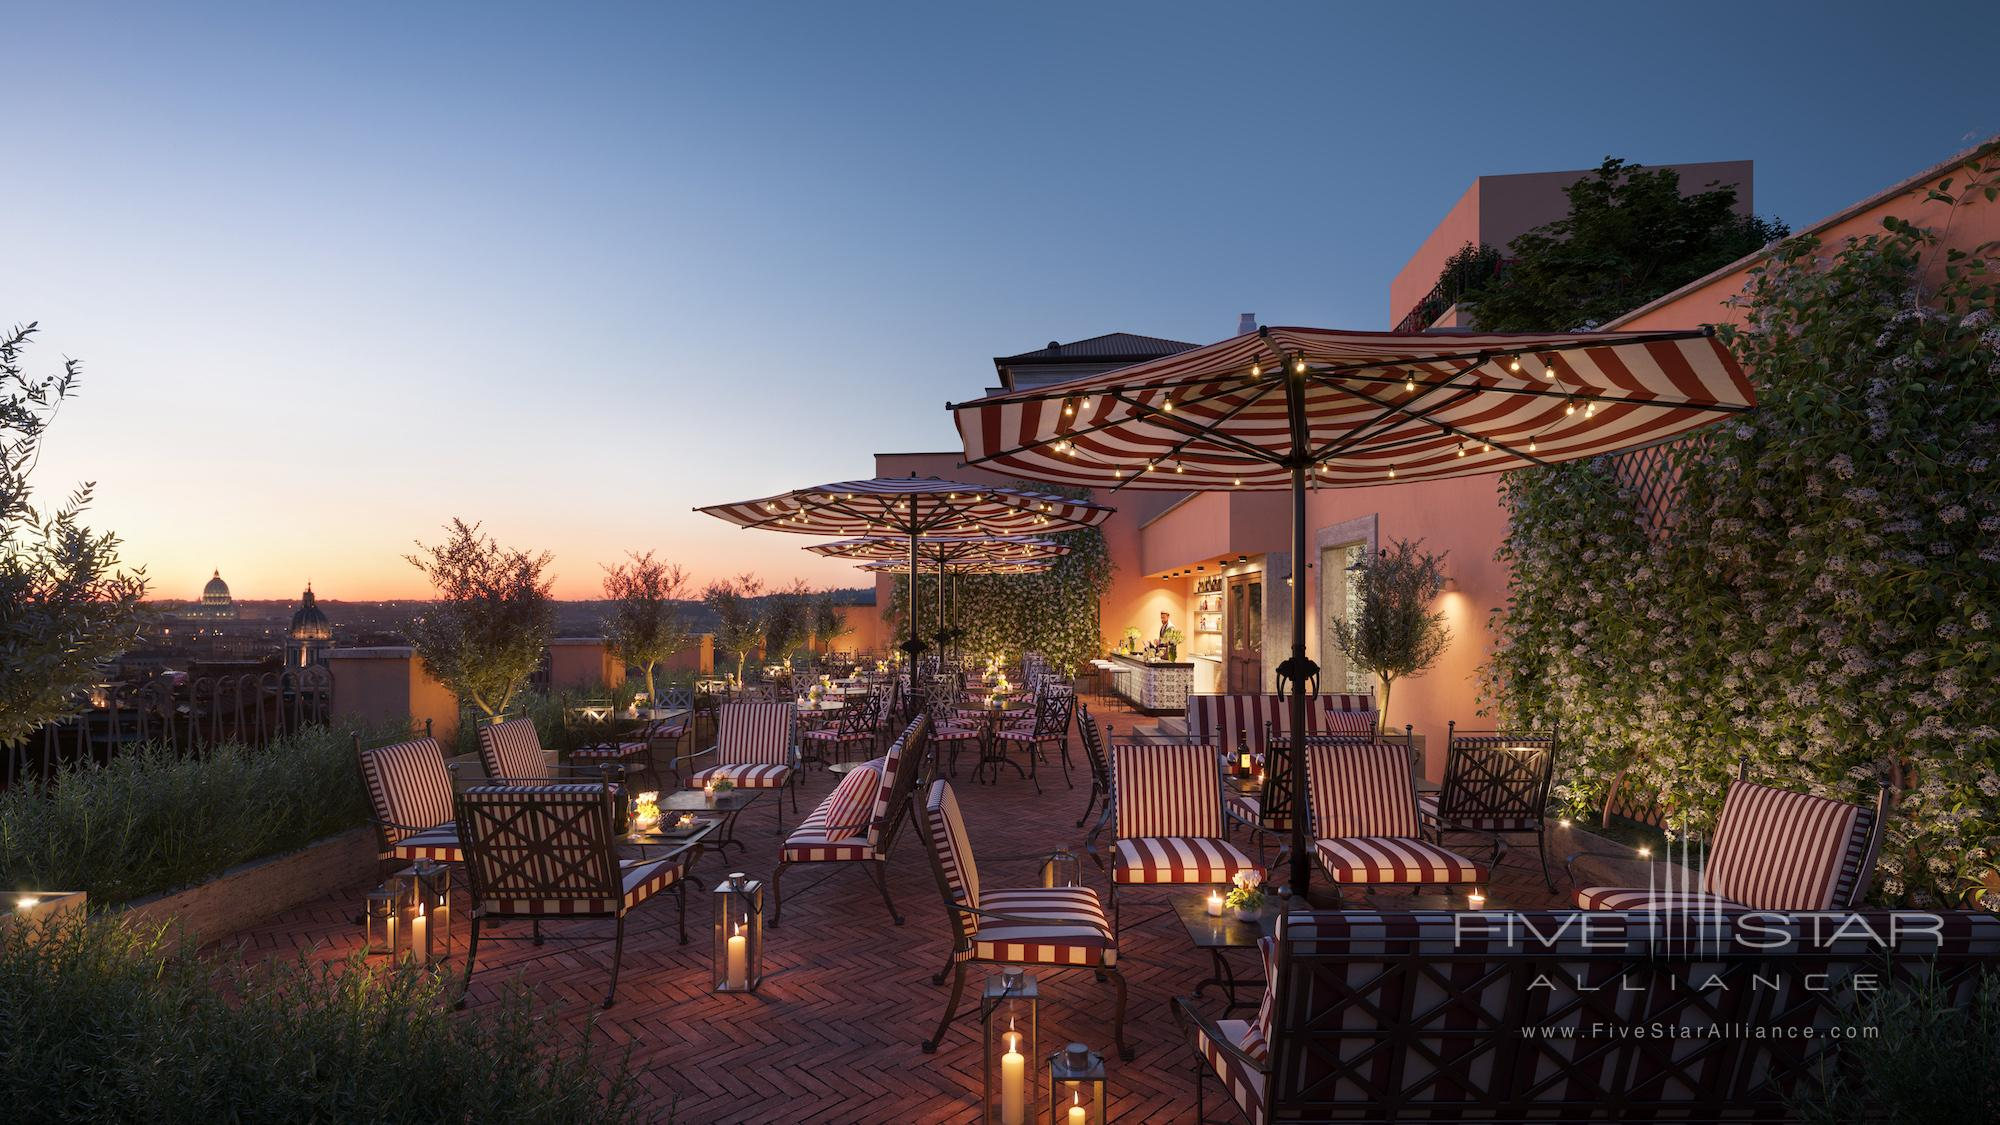 Hotel De La Butte canova suite & perks at rocco forte hotel de la ville | five